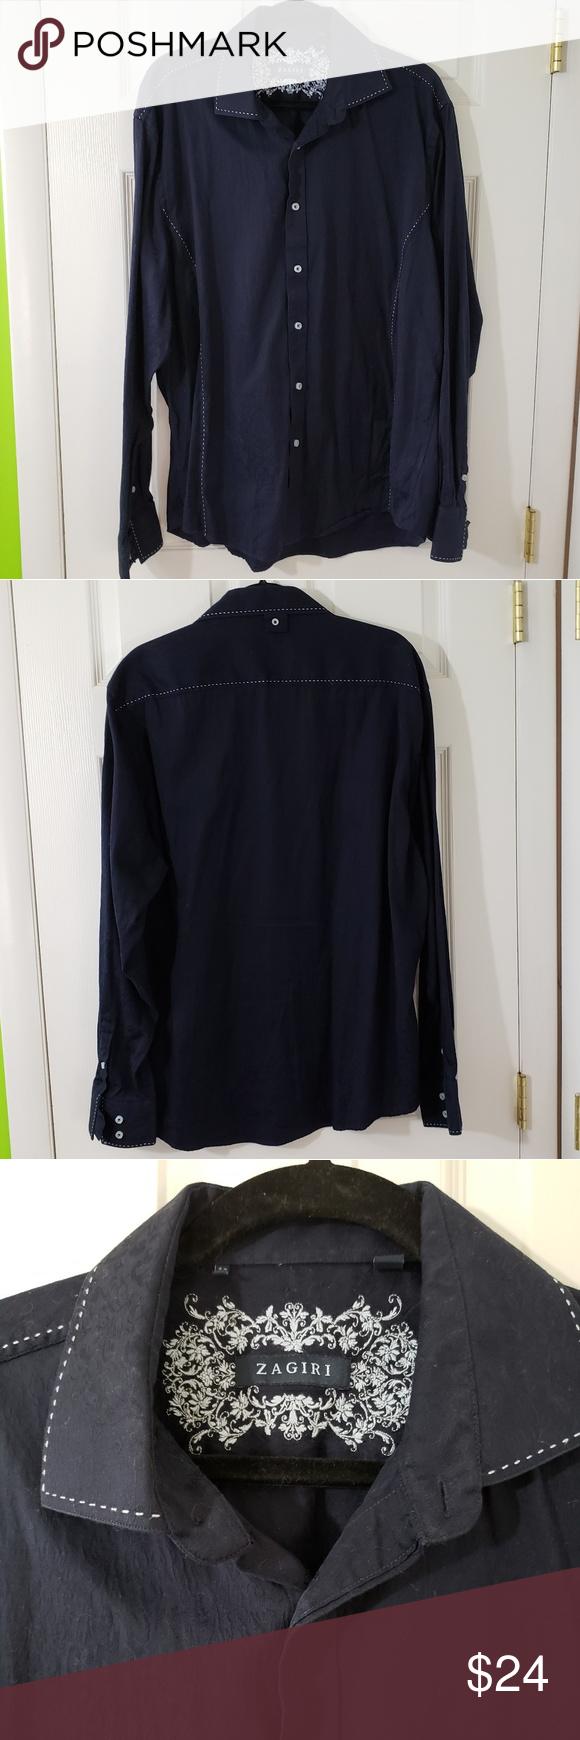 Men's Zagiri Button-down Shirt